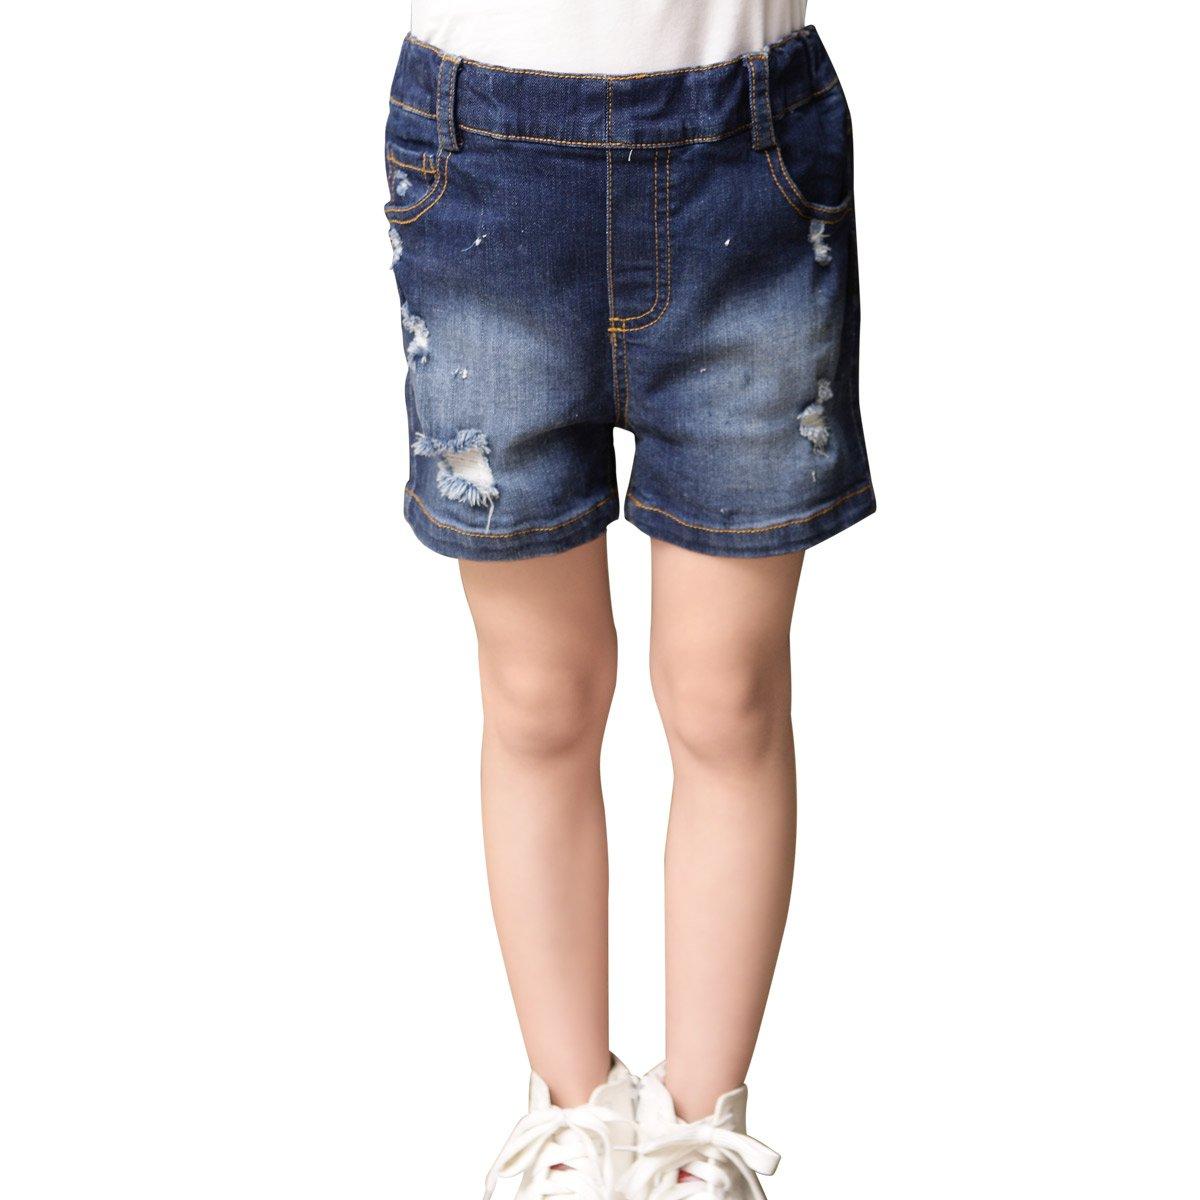 OnlyAngel Girls' Fashion Elastic Waist Summer Soft Denim Shorts 4-13 yrs (10-11 Years)